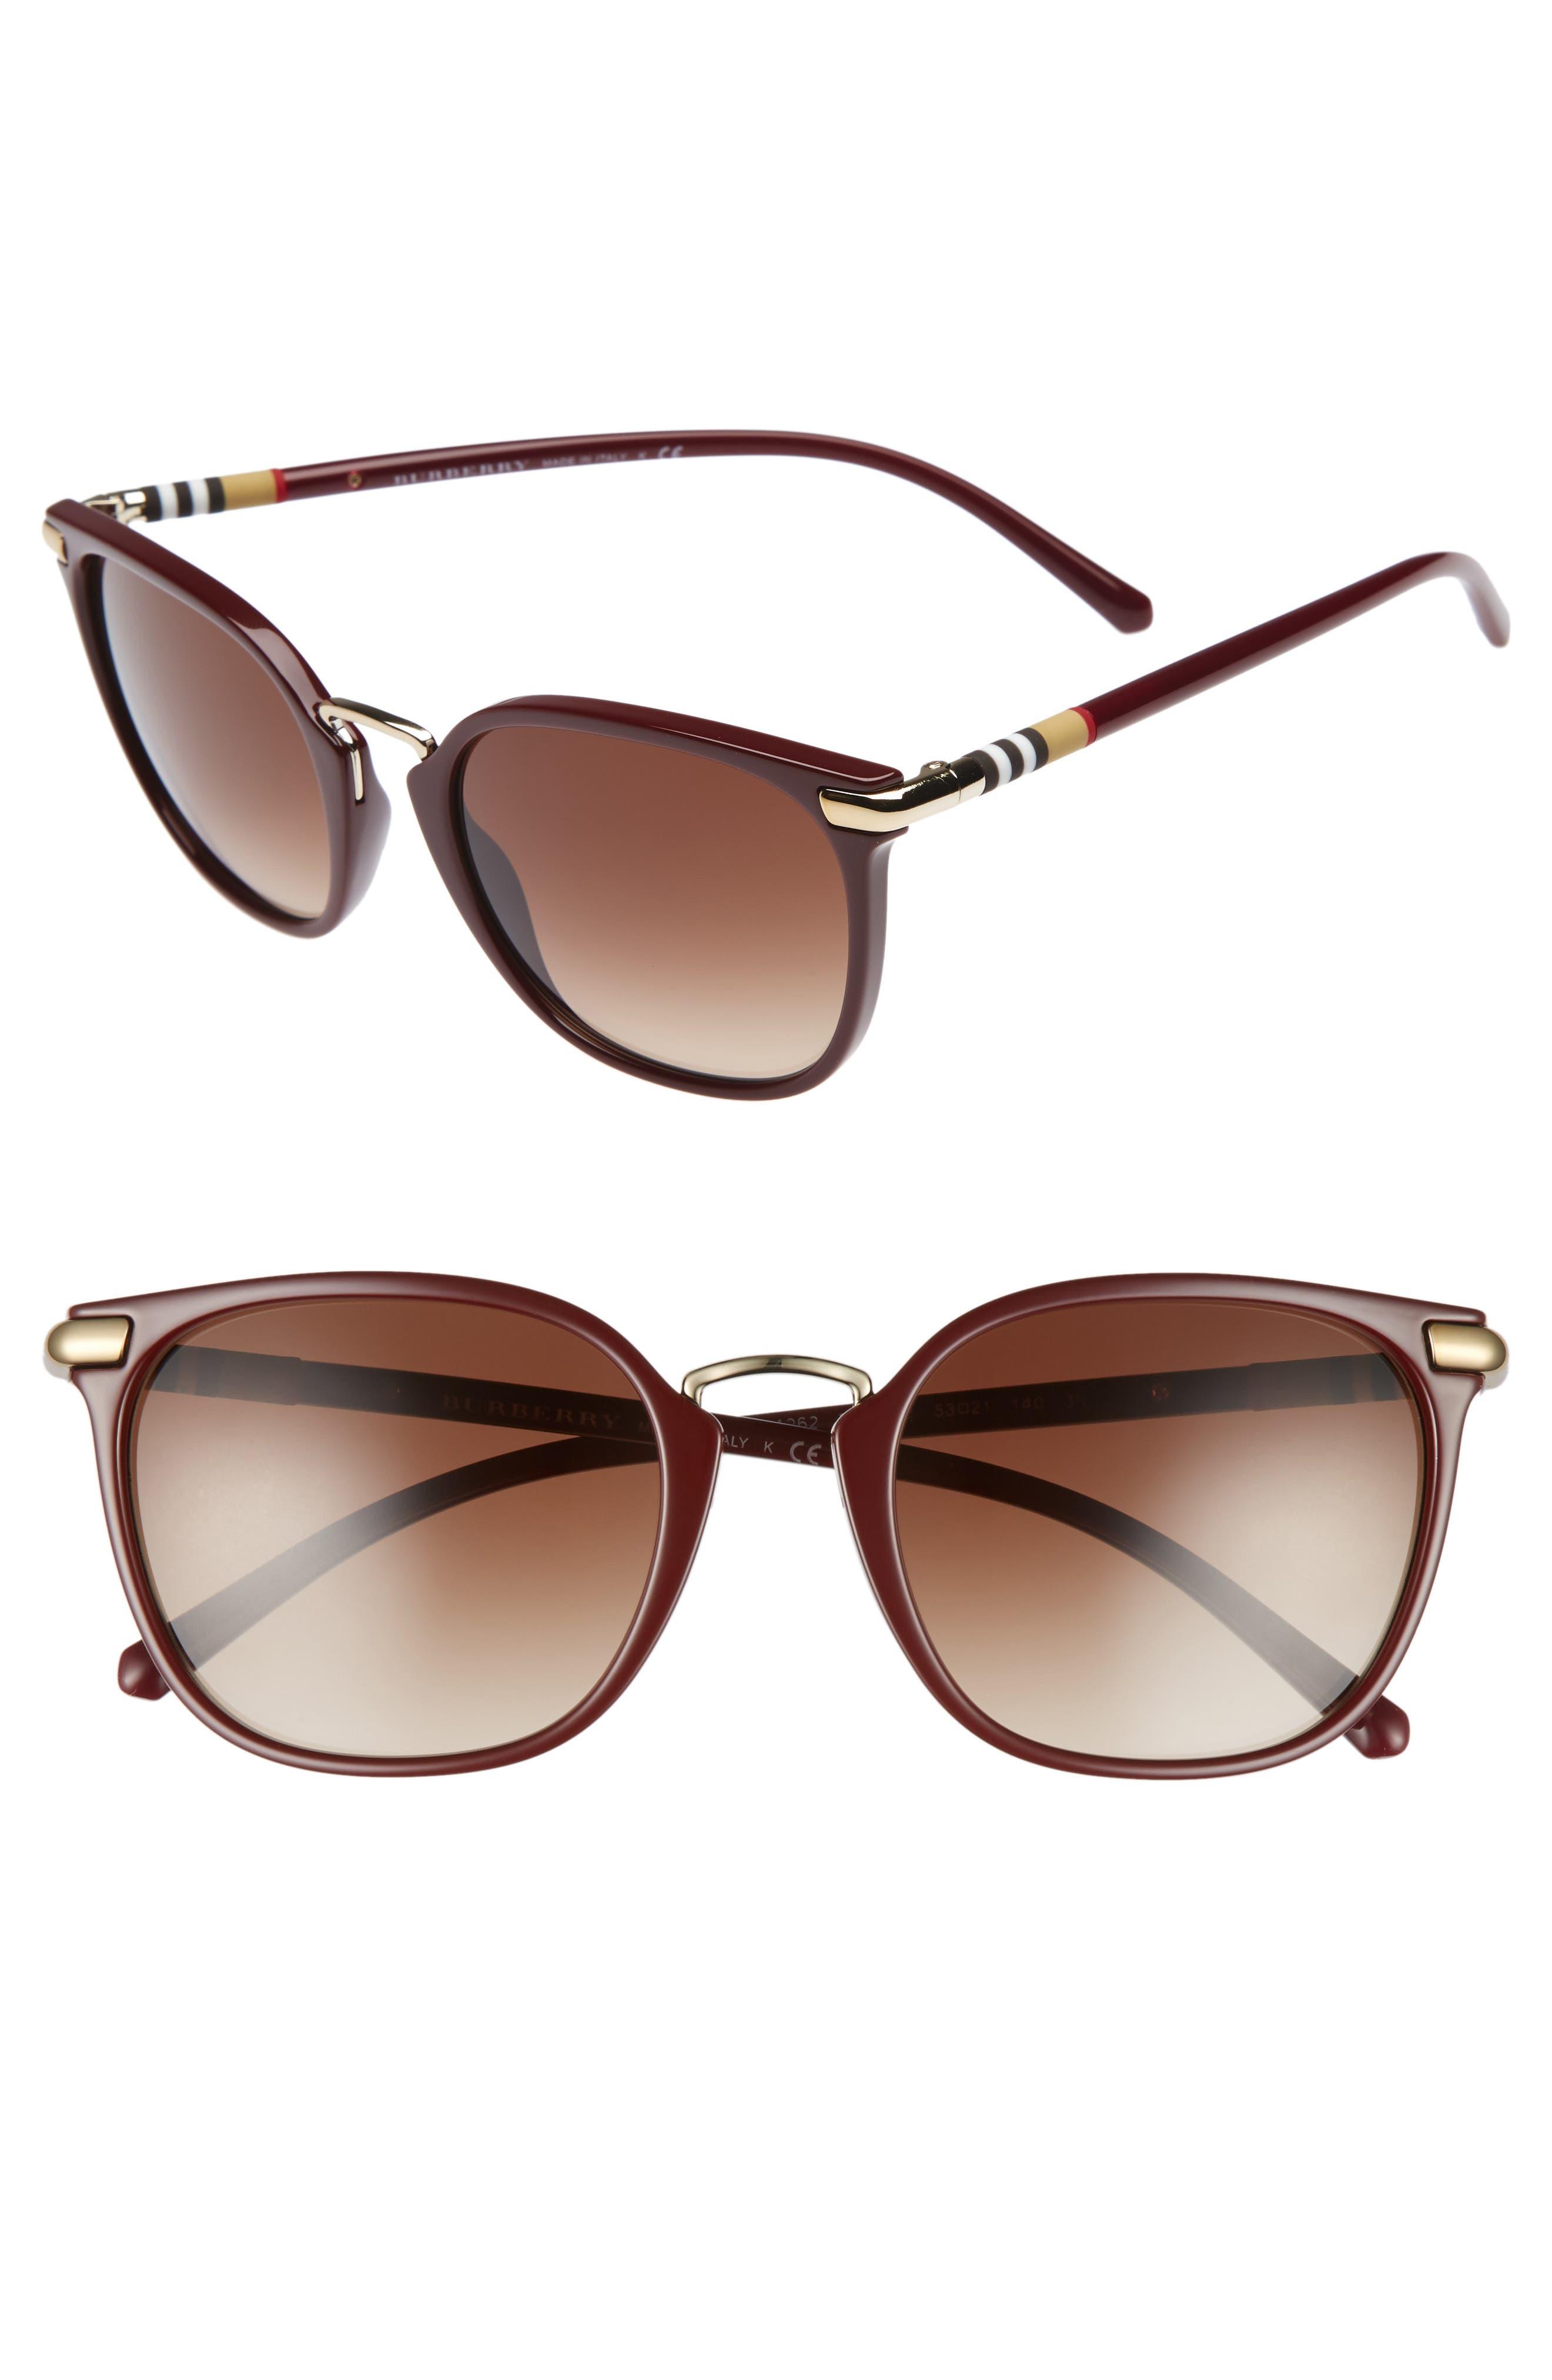 Main Image - Burberry 53mm Gradient Square Sunglasses